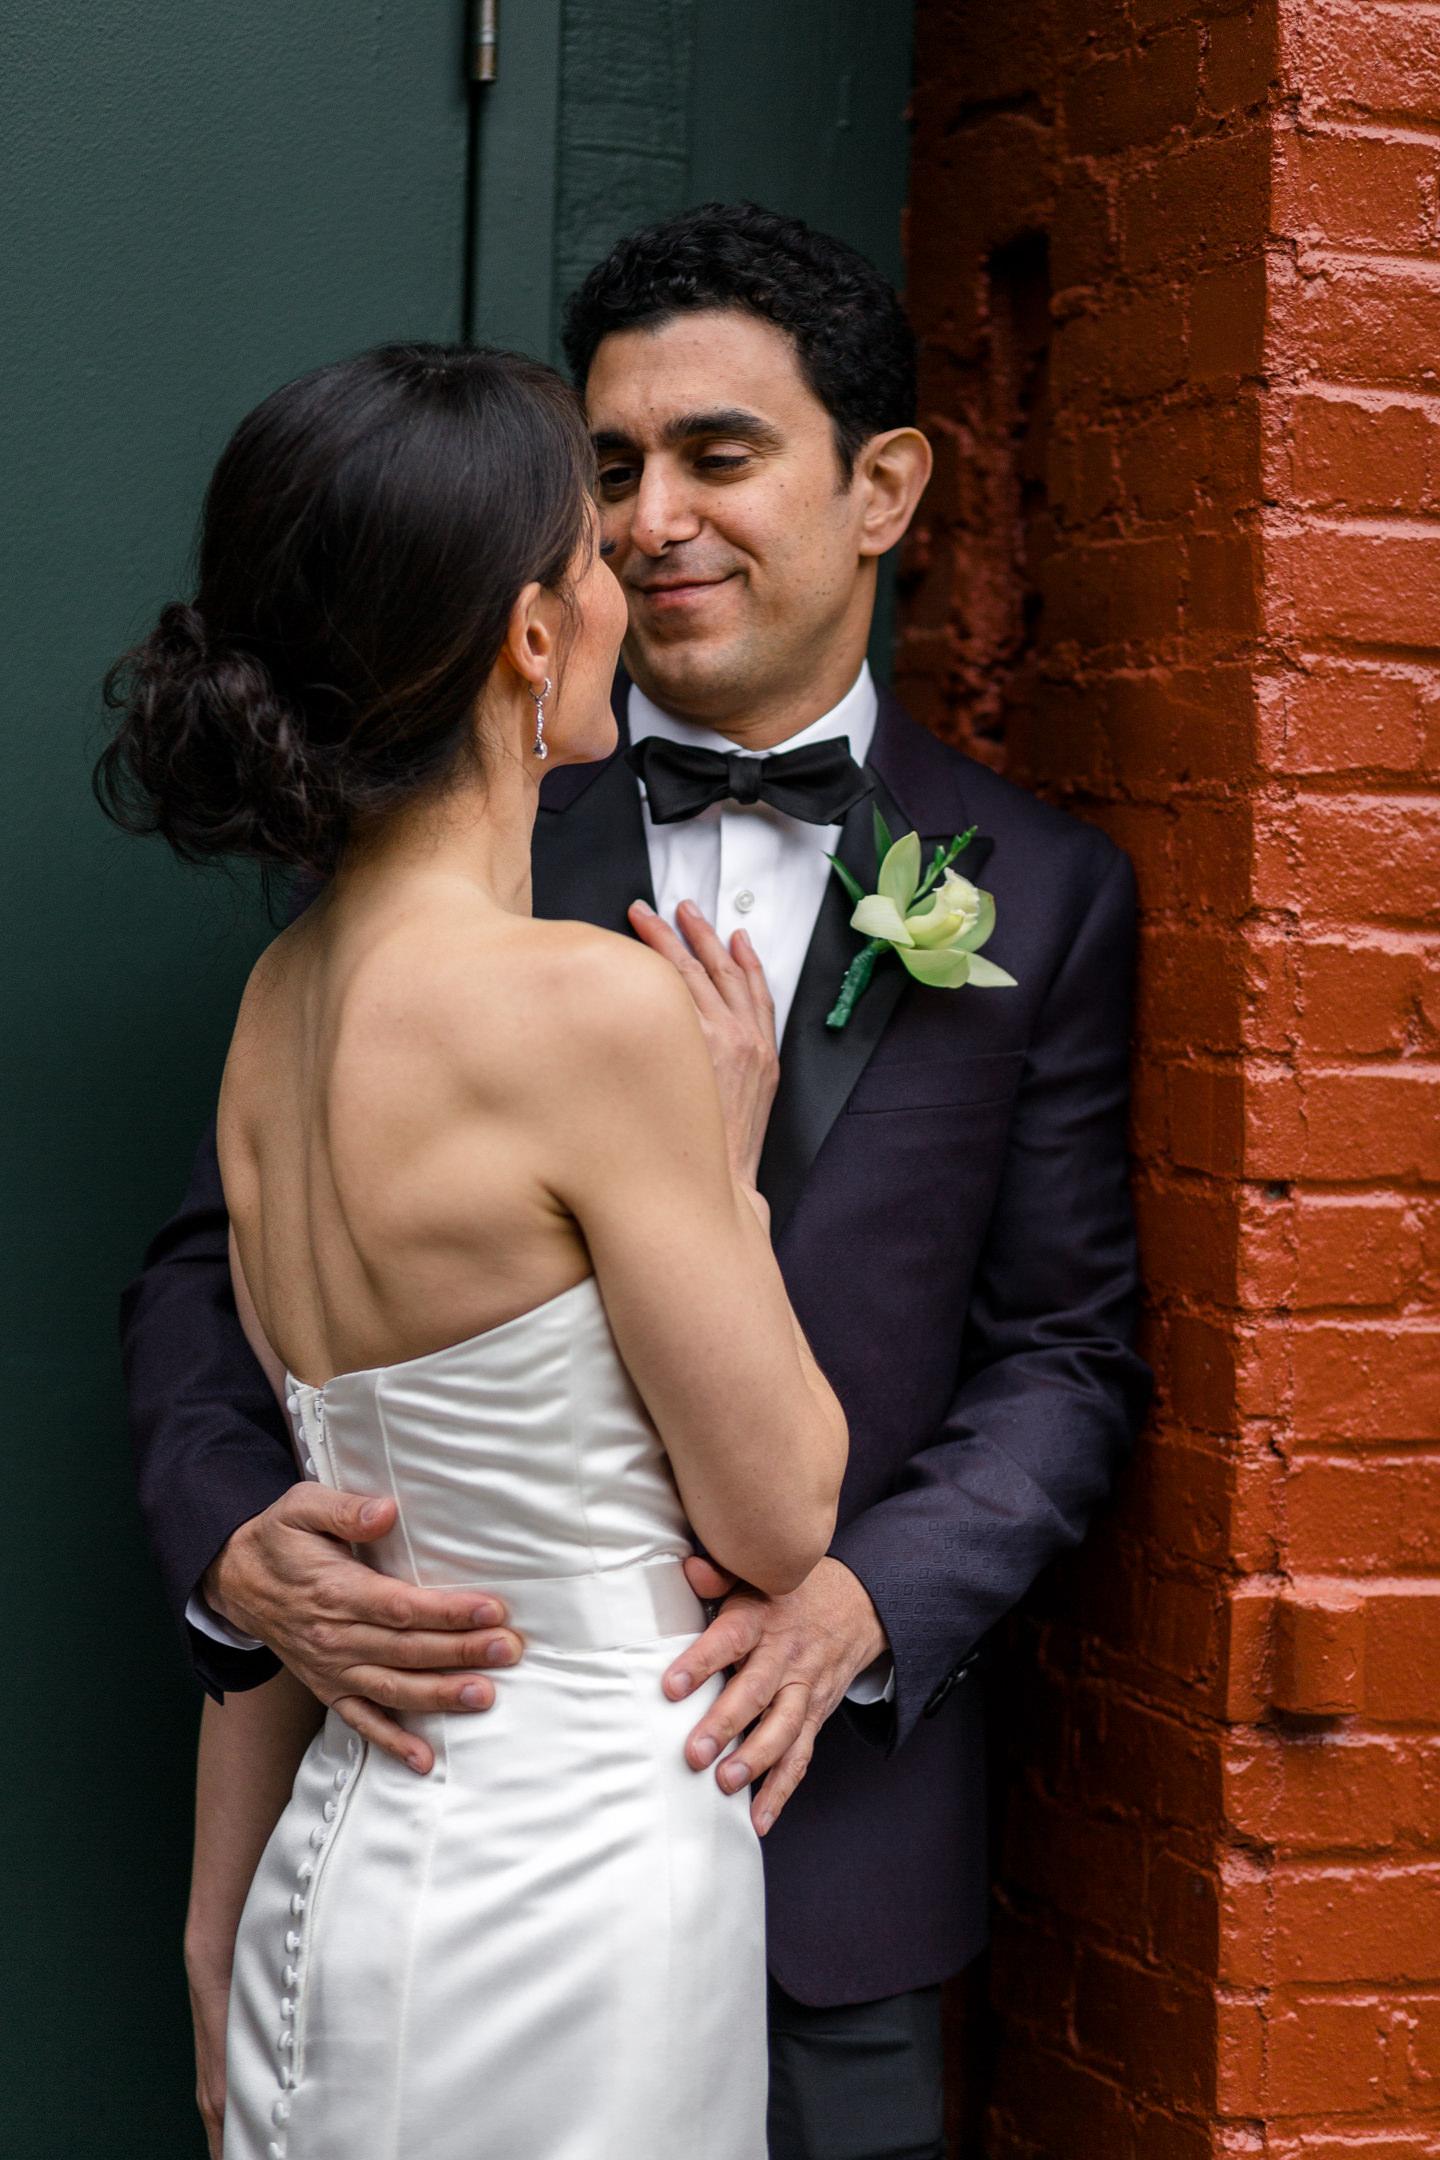 Documentary-Wedding-Photography-Andrew-Tat-Maria & AJ-09.jpg